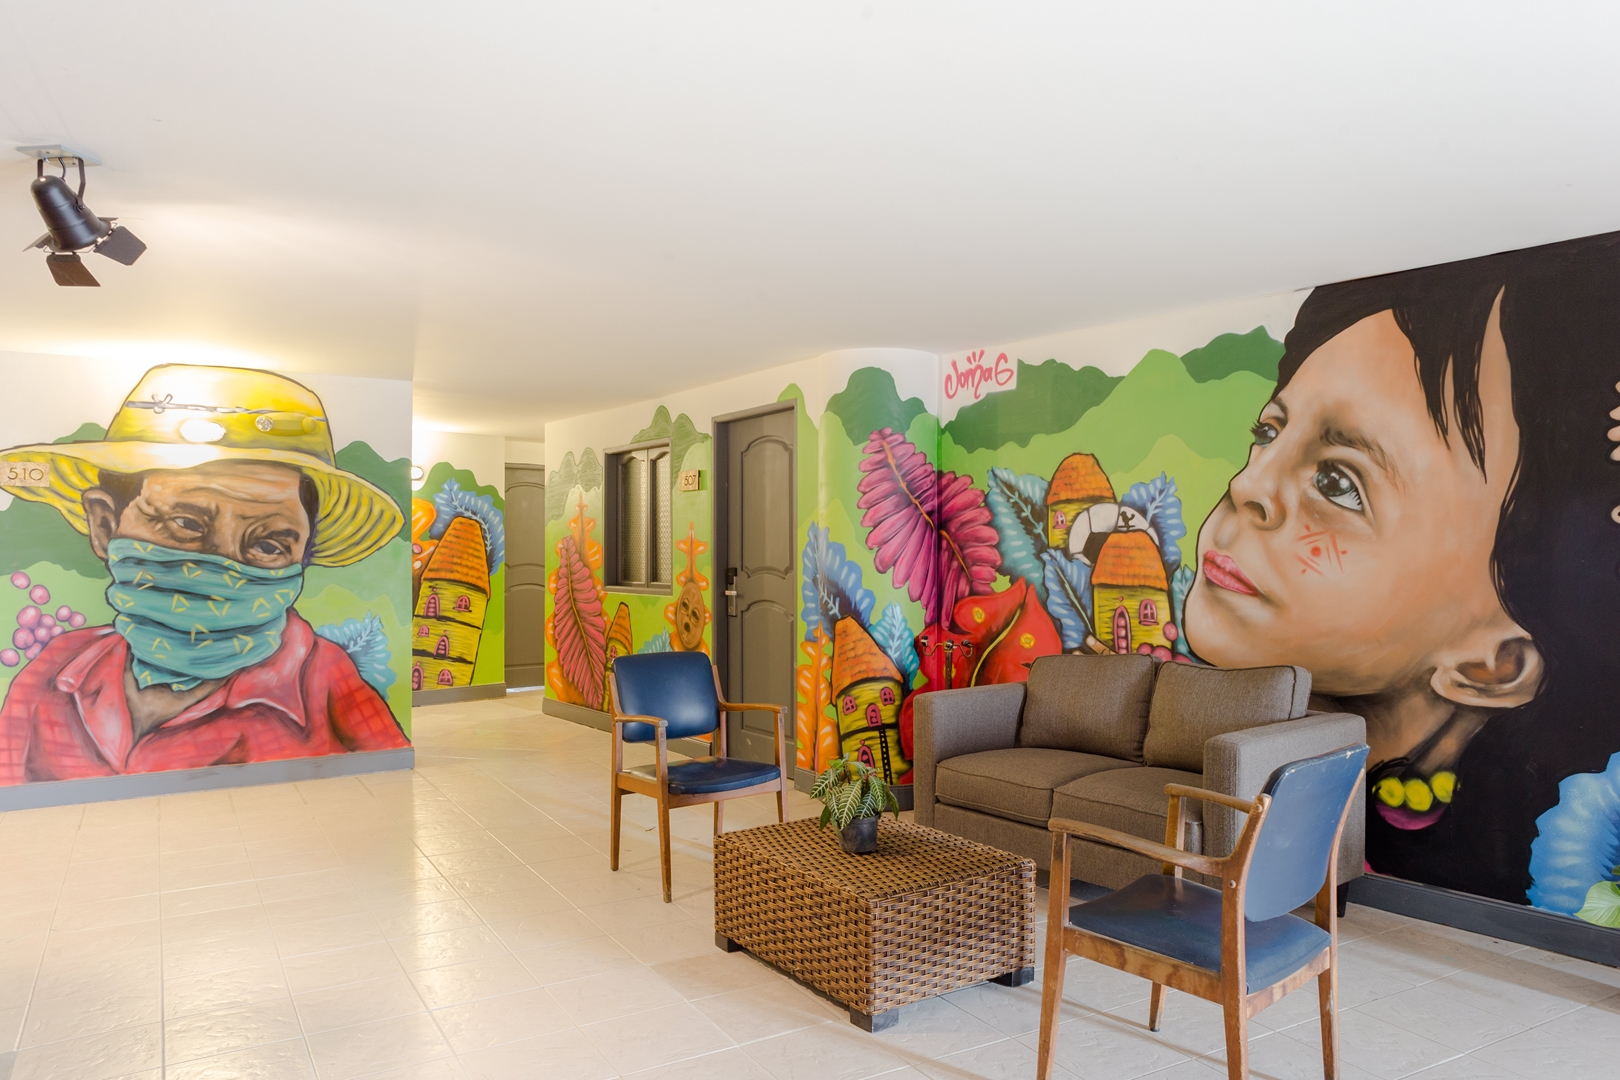 Selina Hotel Medellin Colombia006 (Copy)